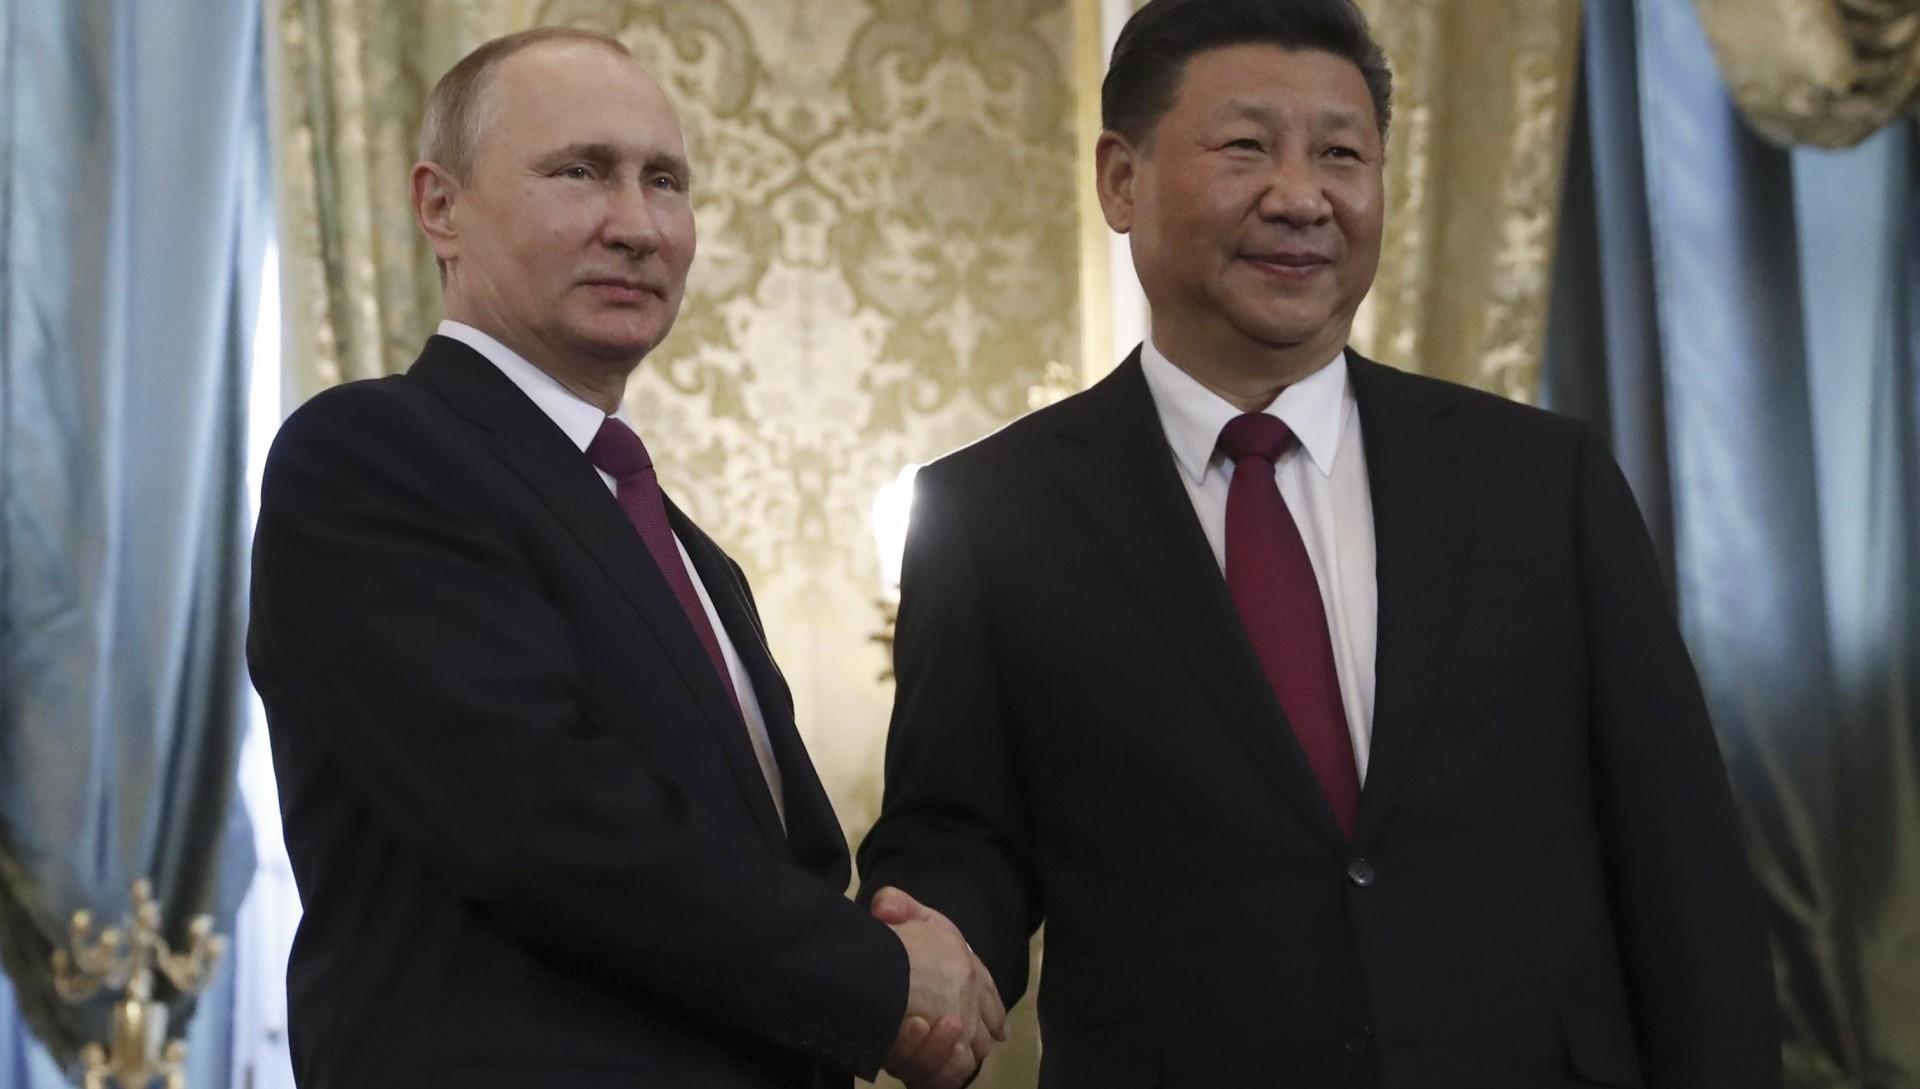 Vladimir Putin saluda a Xi Jinpingdurante una visita oficial en el Kremlin (REUTERS/Sergei Ilnitsky/Pool)